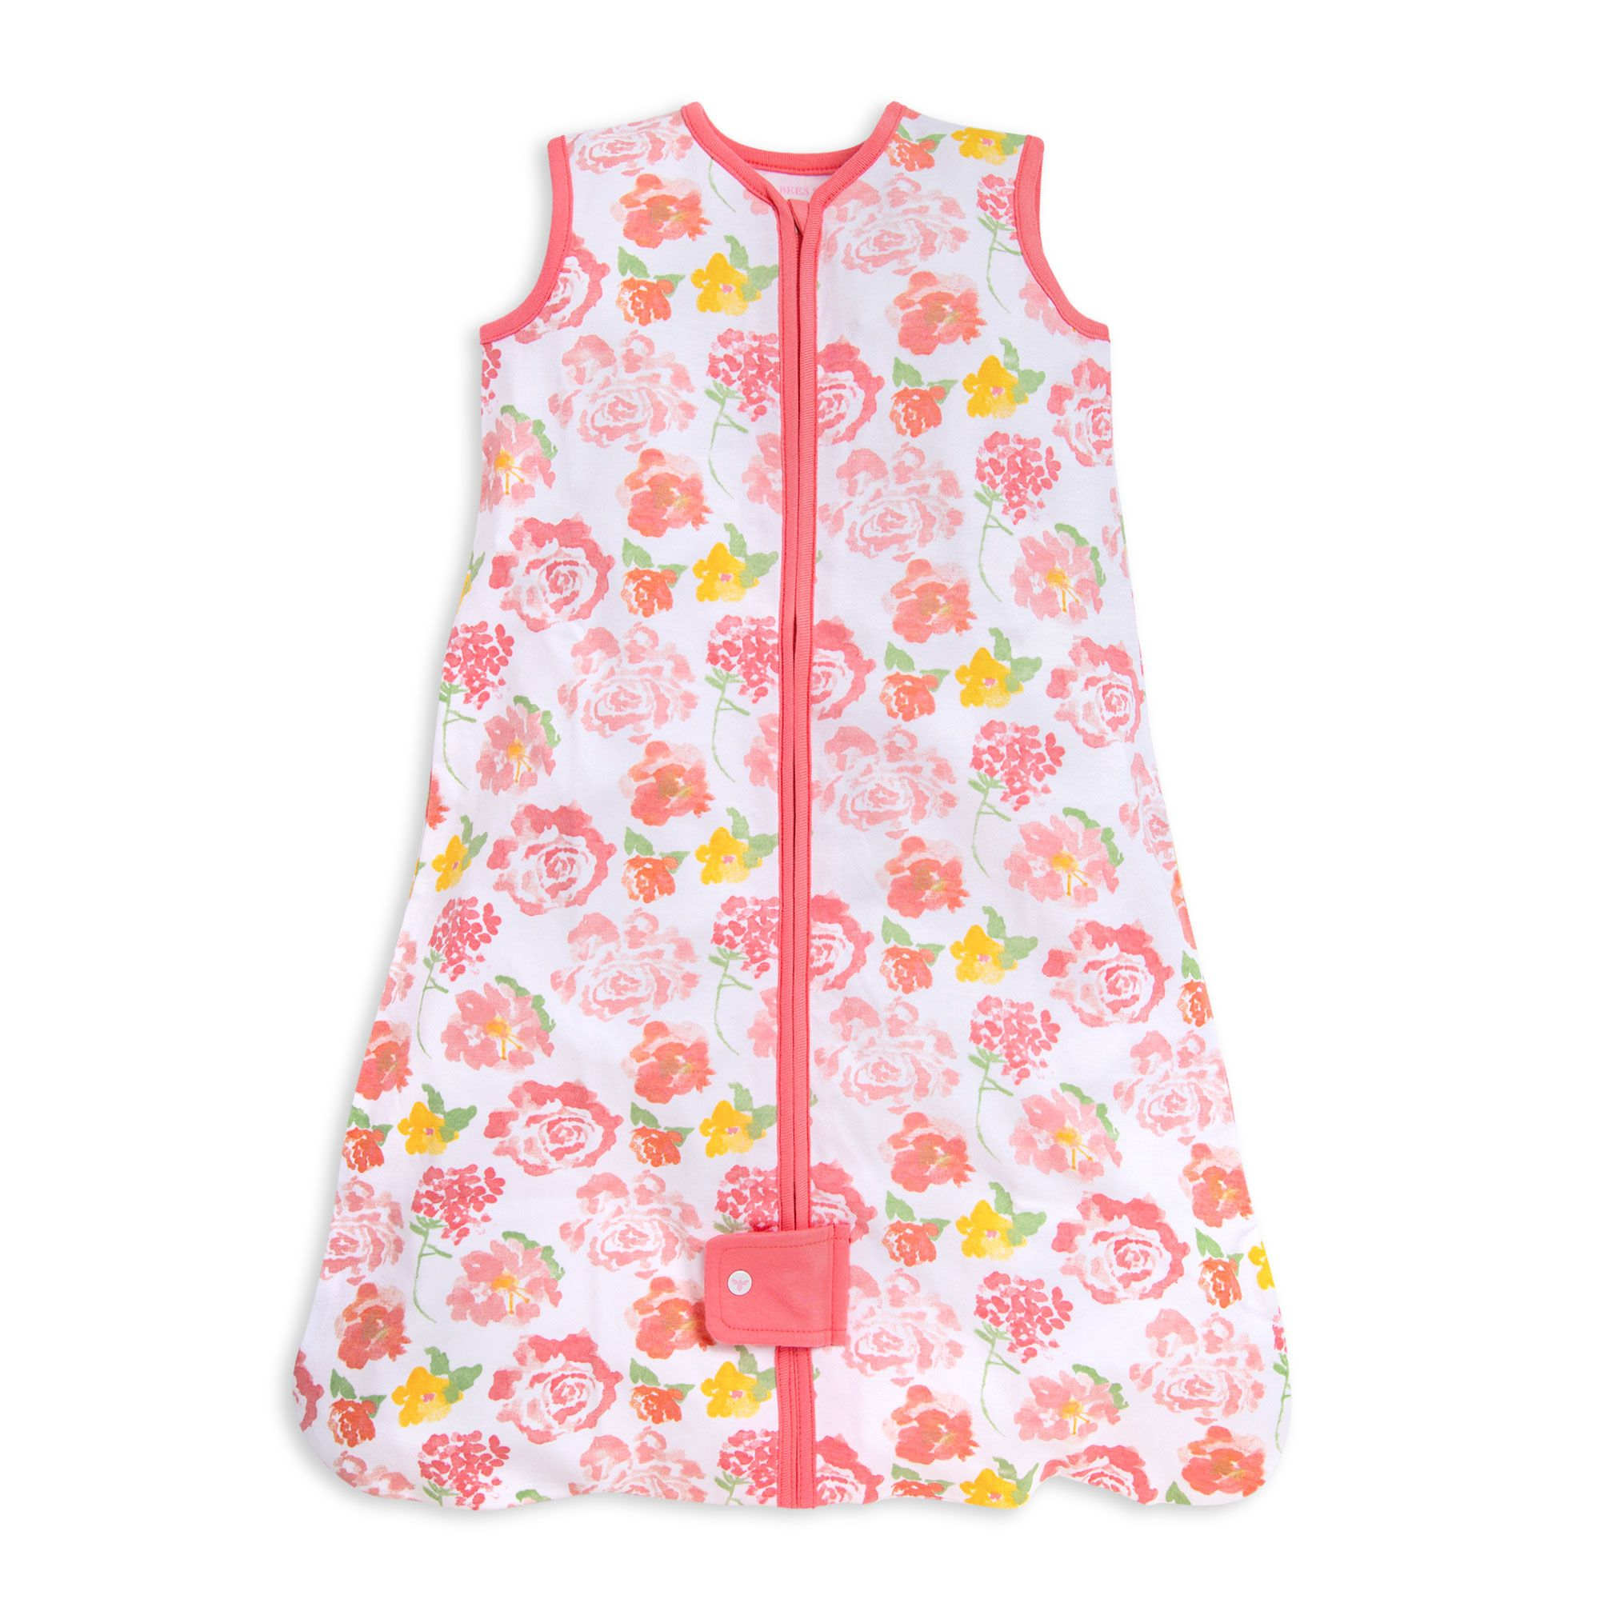 Beekeeper™ Rosy Spring Floral Organic Baby Wearable Blanket